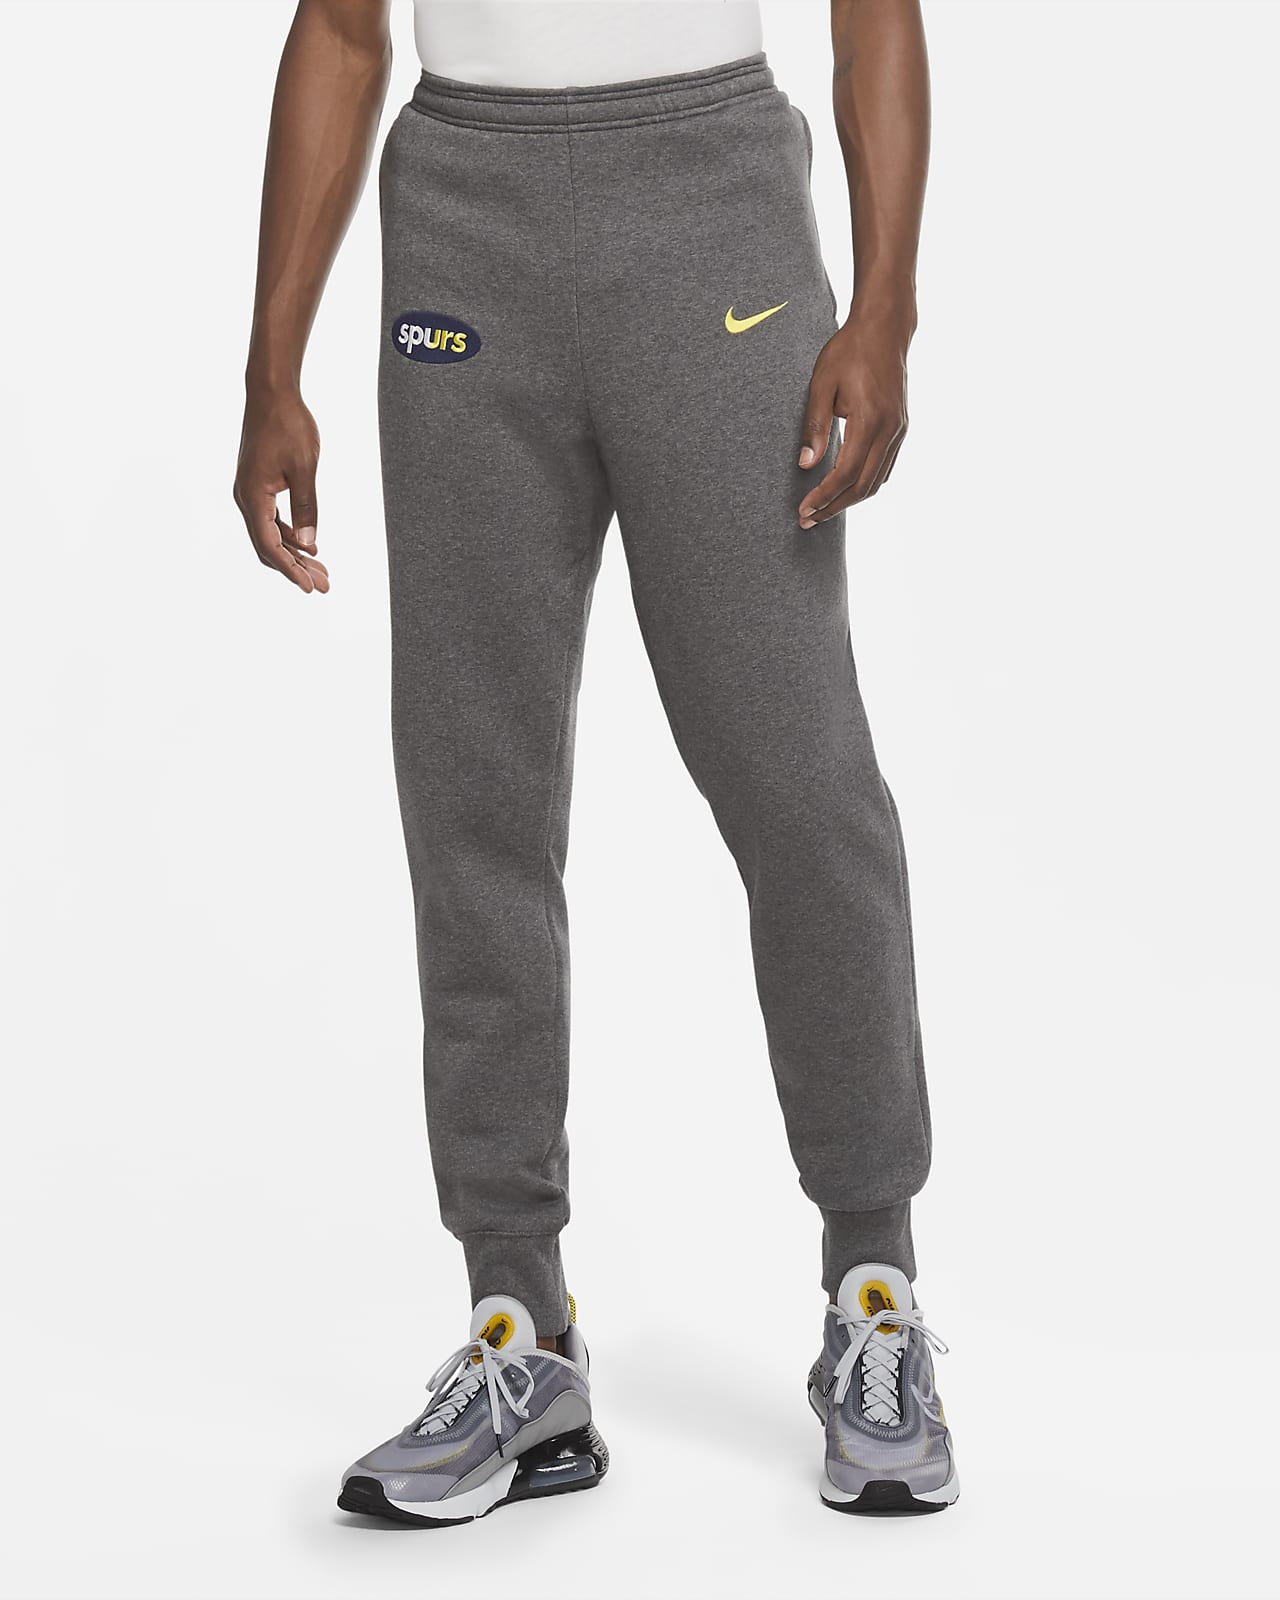 Tottenham Hotspur Men's Fleece Soccer Pants